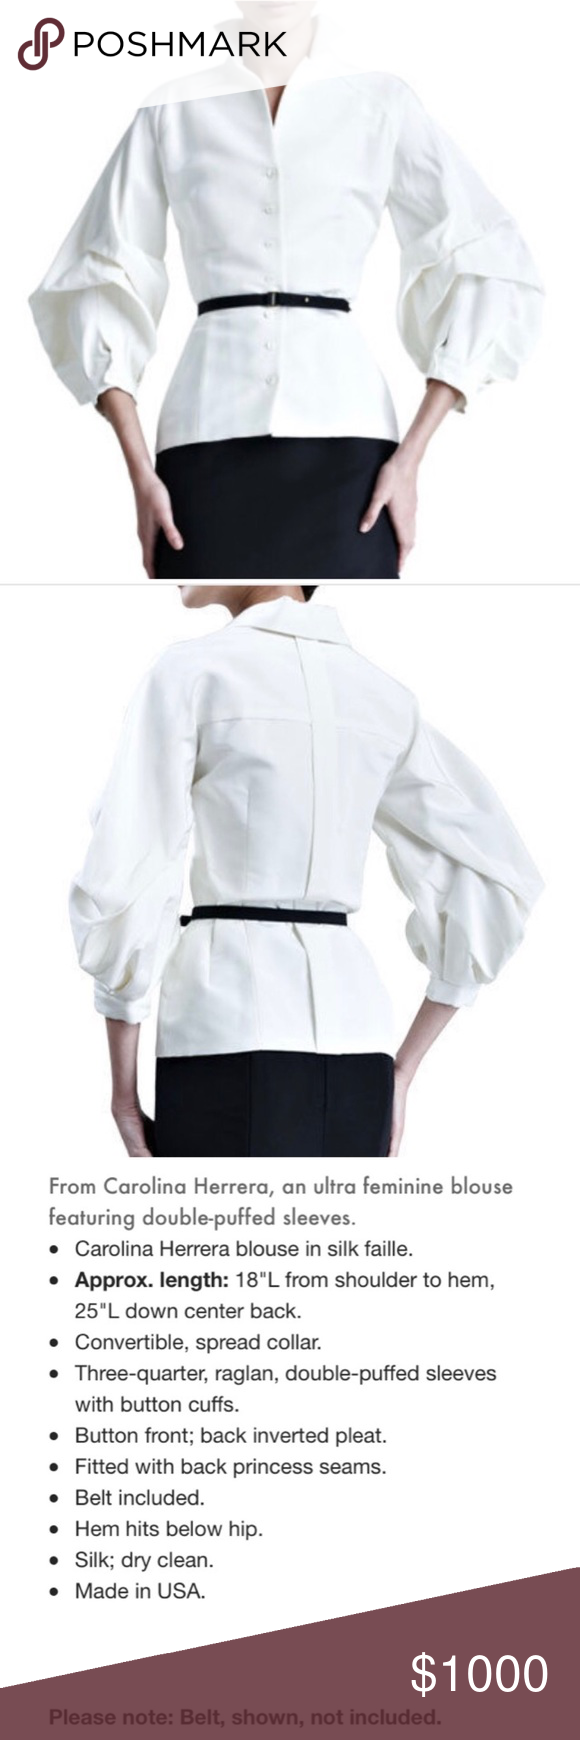 3 4 sleeve silk saree blouse designs euc carolina herrera silk faille blouse worn once and dry cleaned